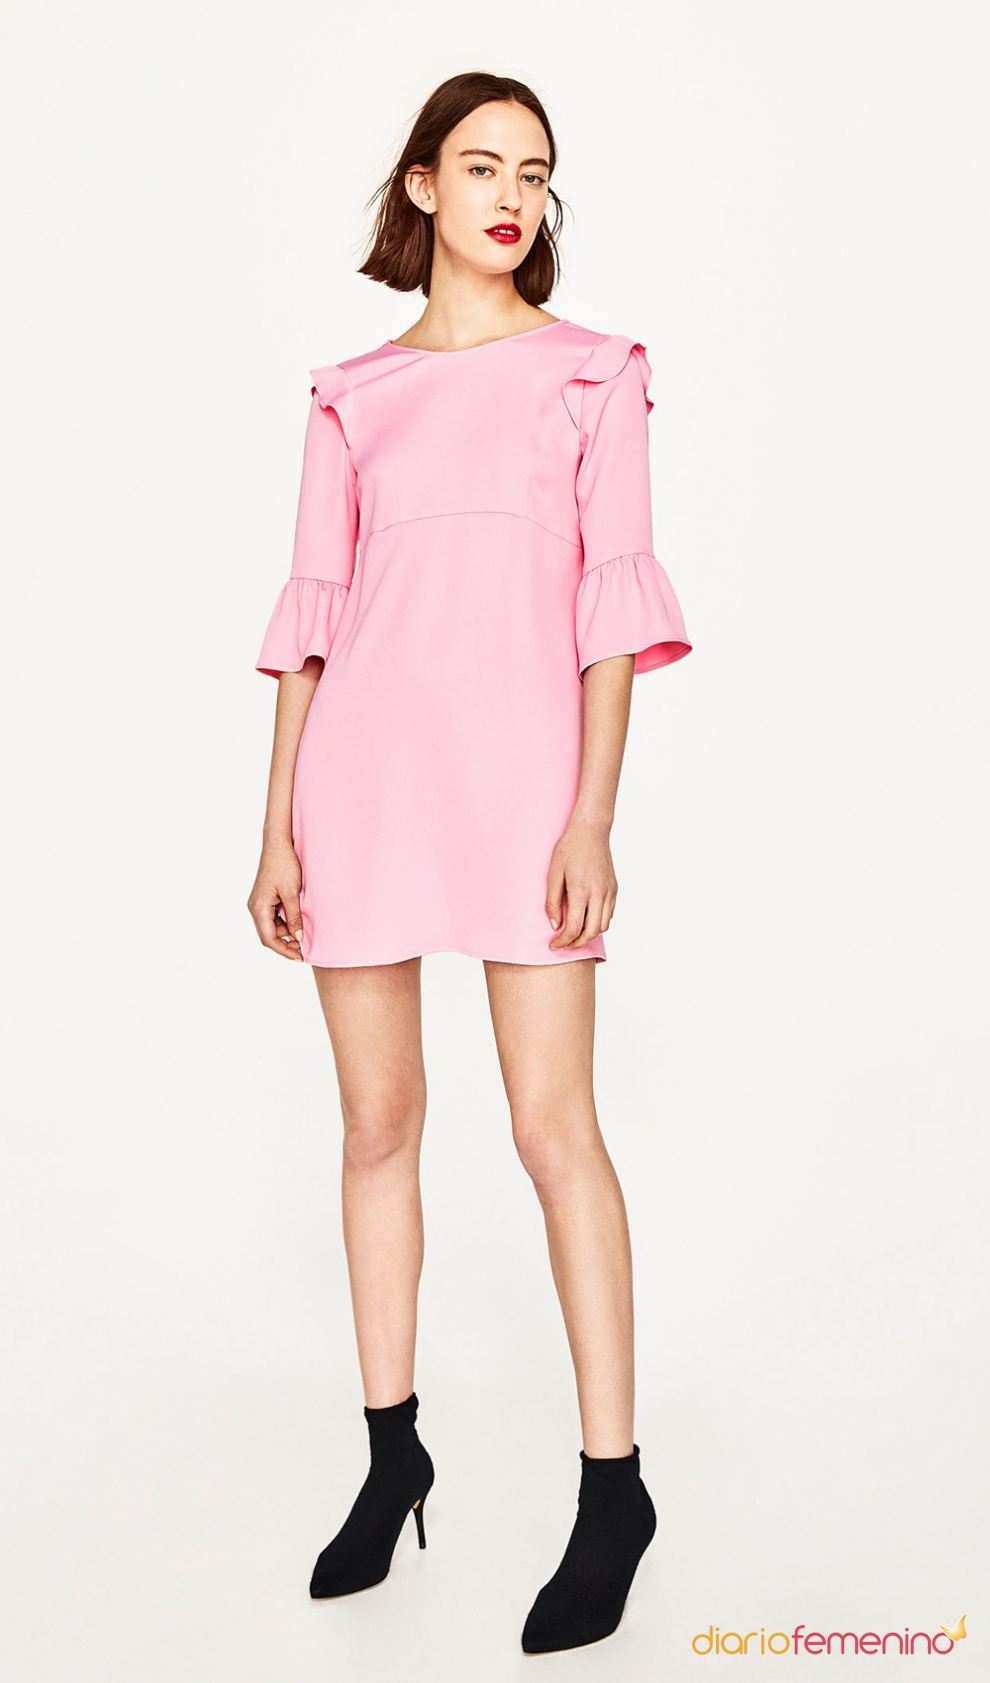 de comunión para mamás: un vestido rosa de ZARA